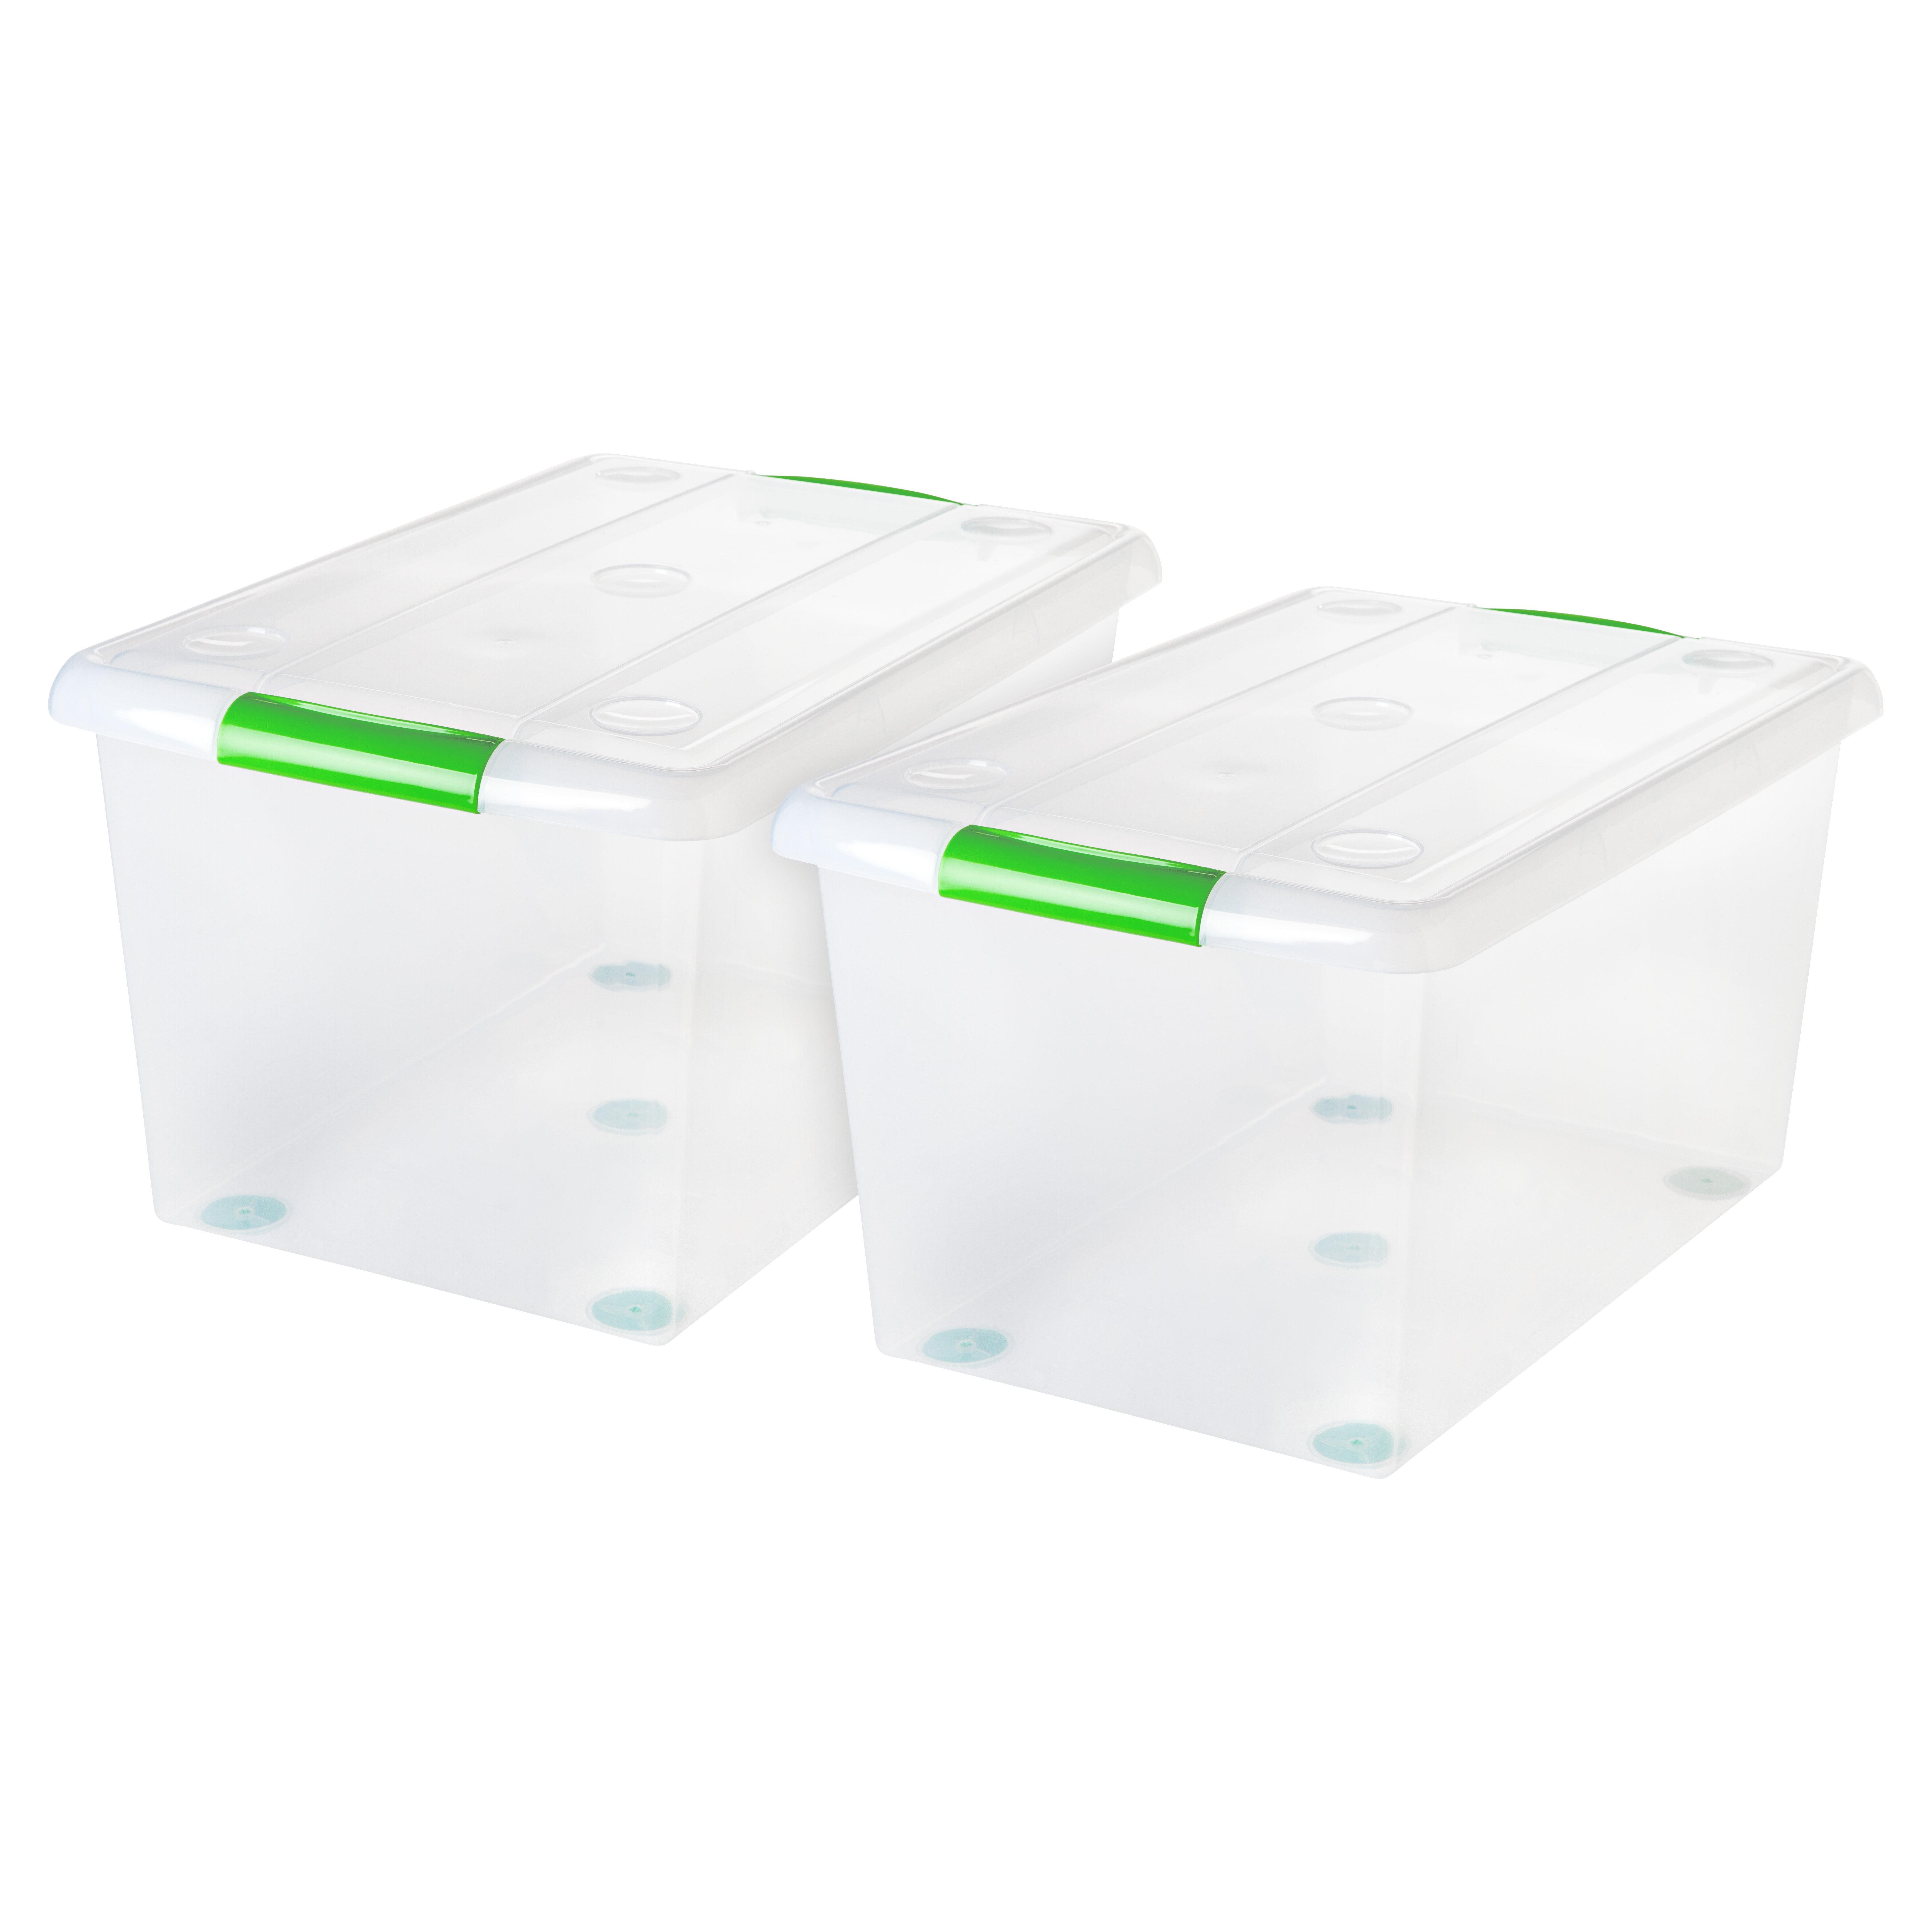 Assorted Colour Large Ratan Basket Home Office Storage Plastic Stackable